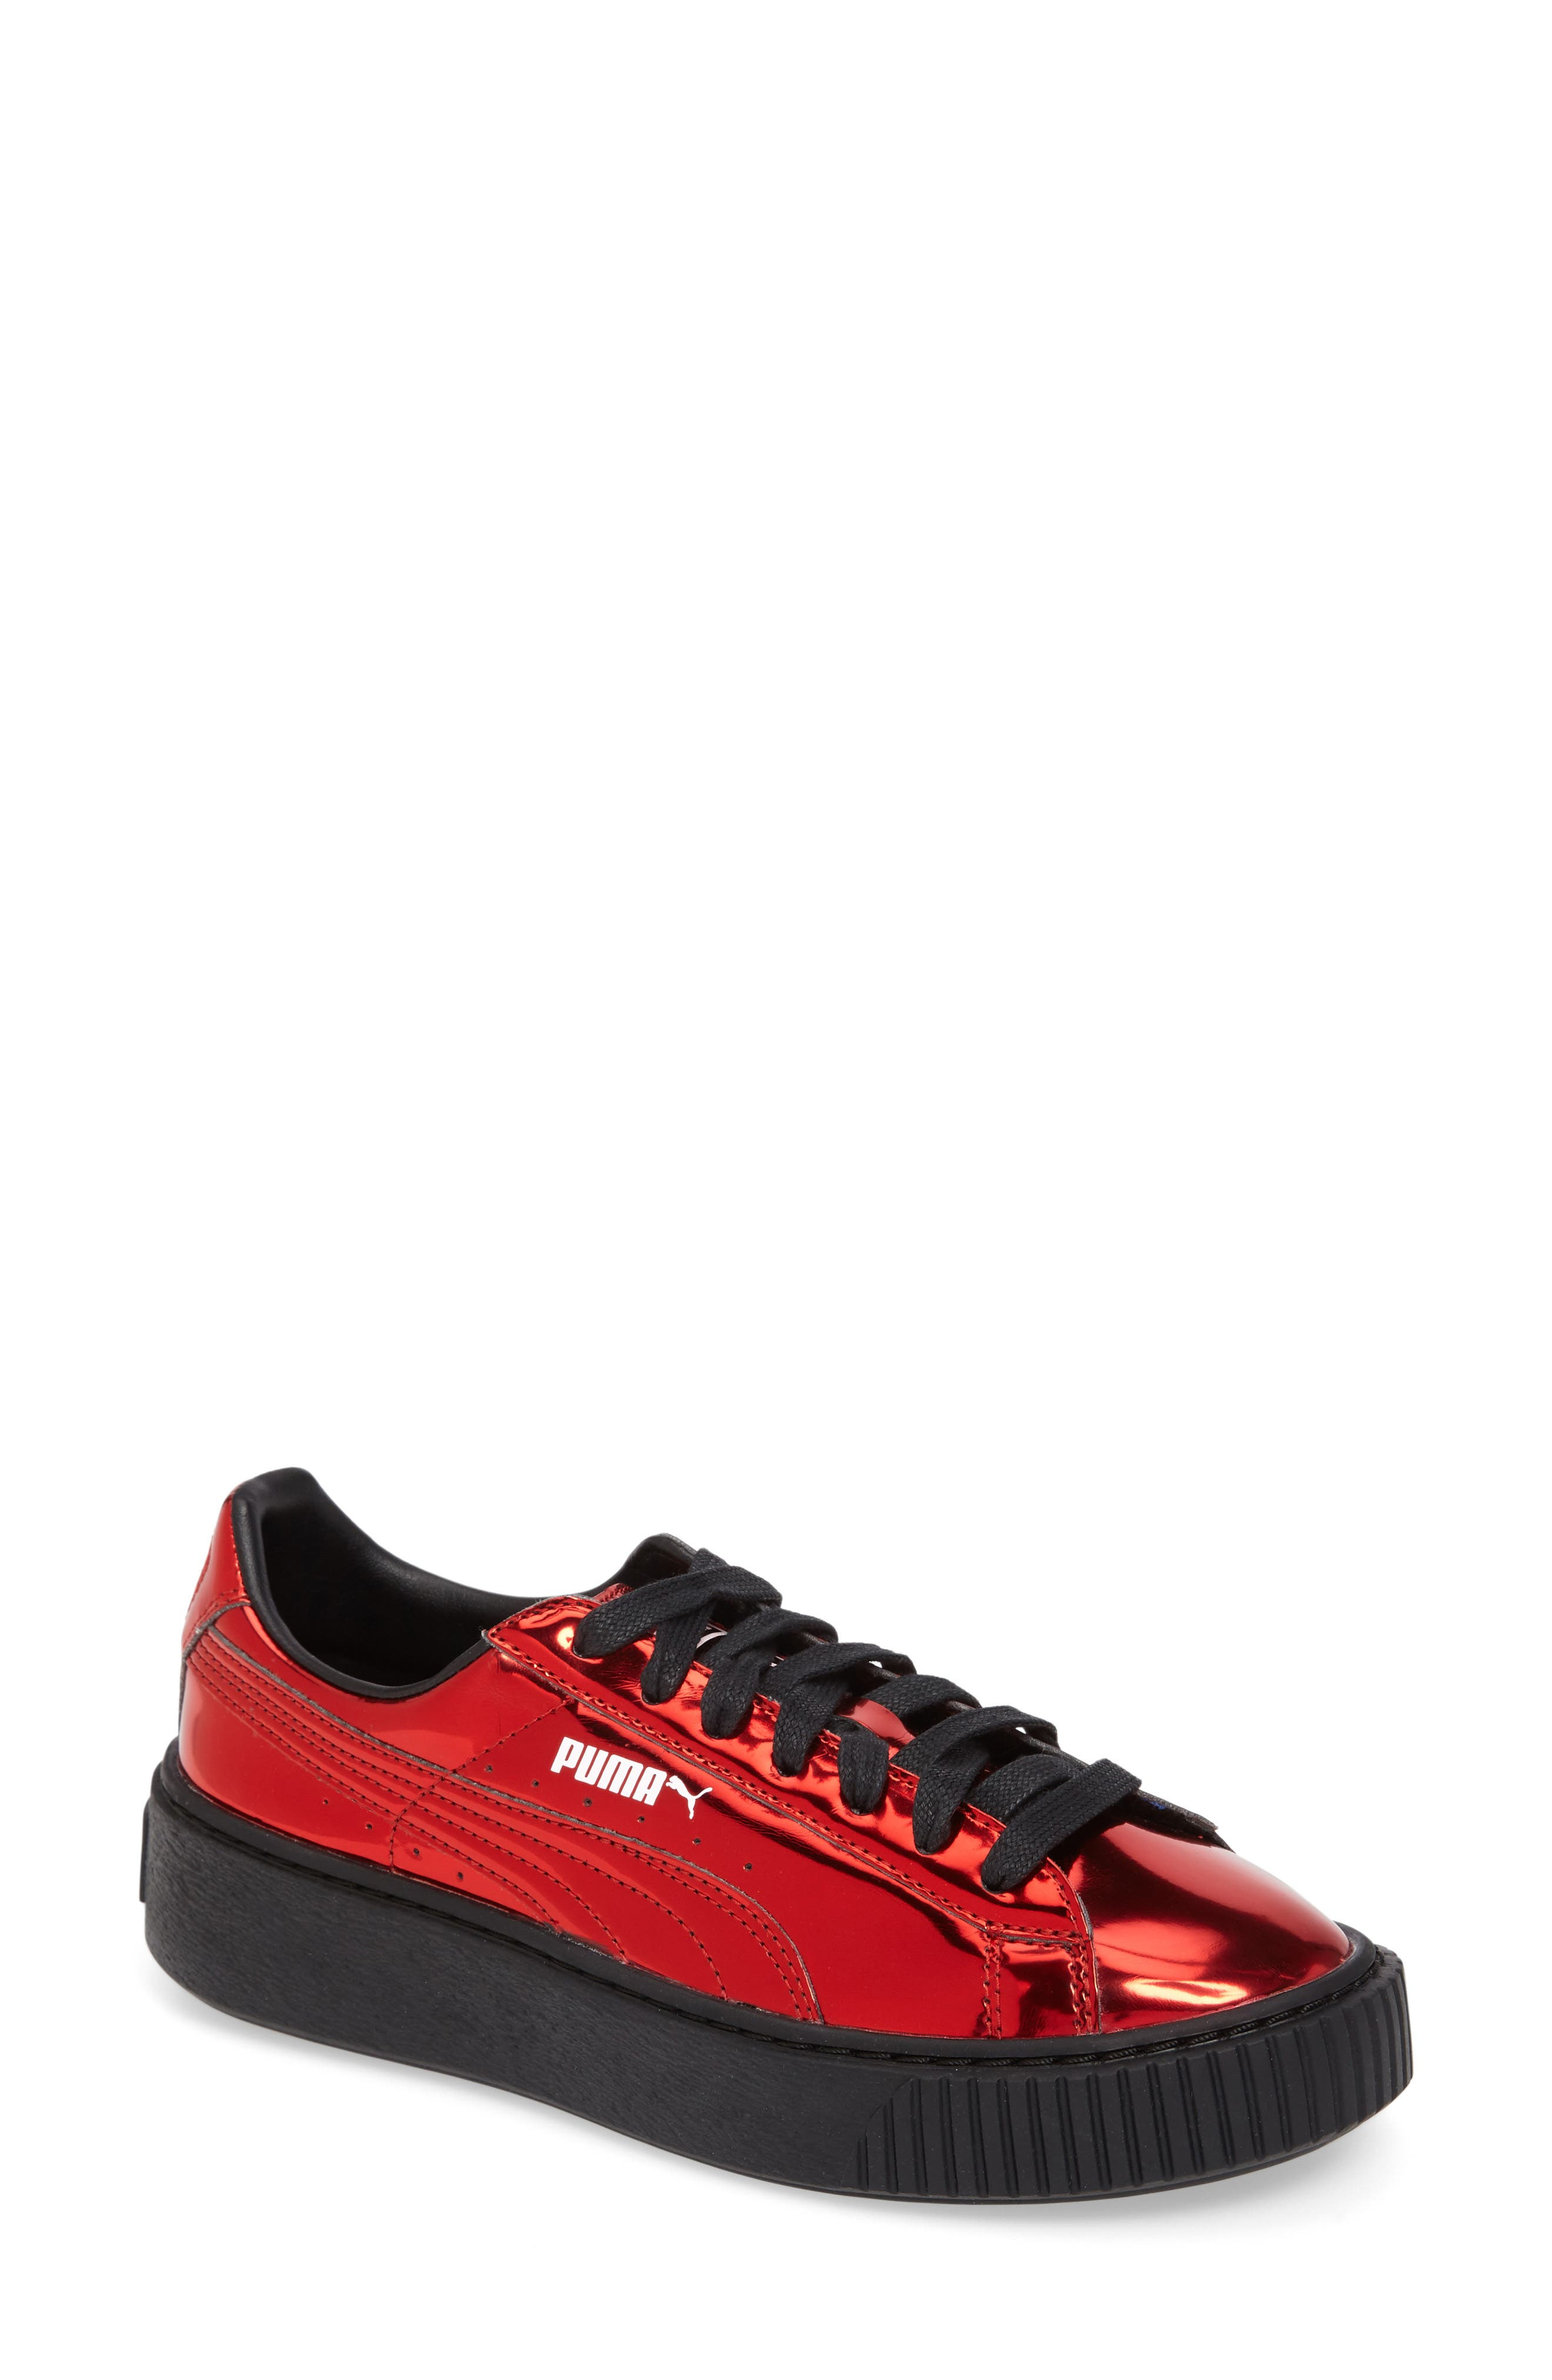 Alternate Image 1 Selected - PUMA Platform Sneaker (Women)